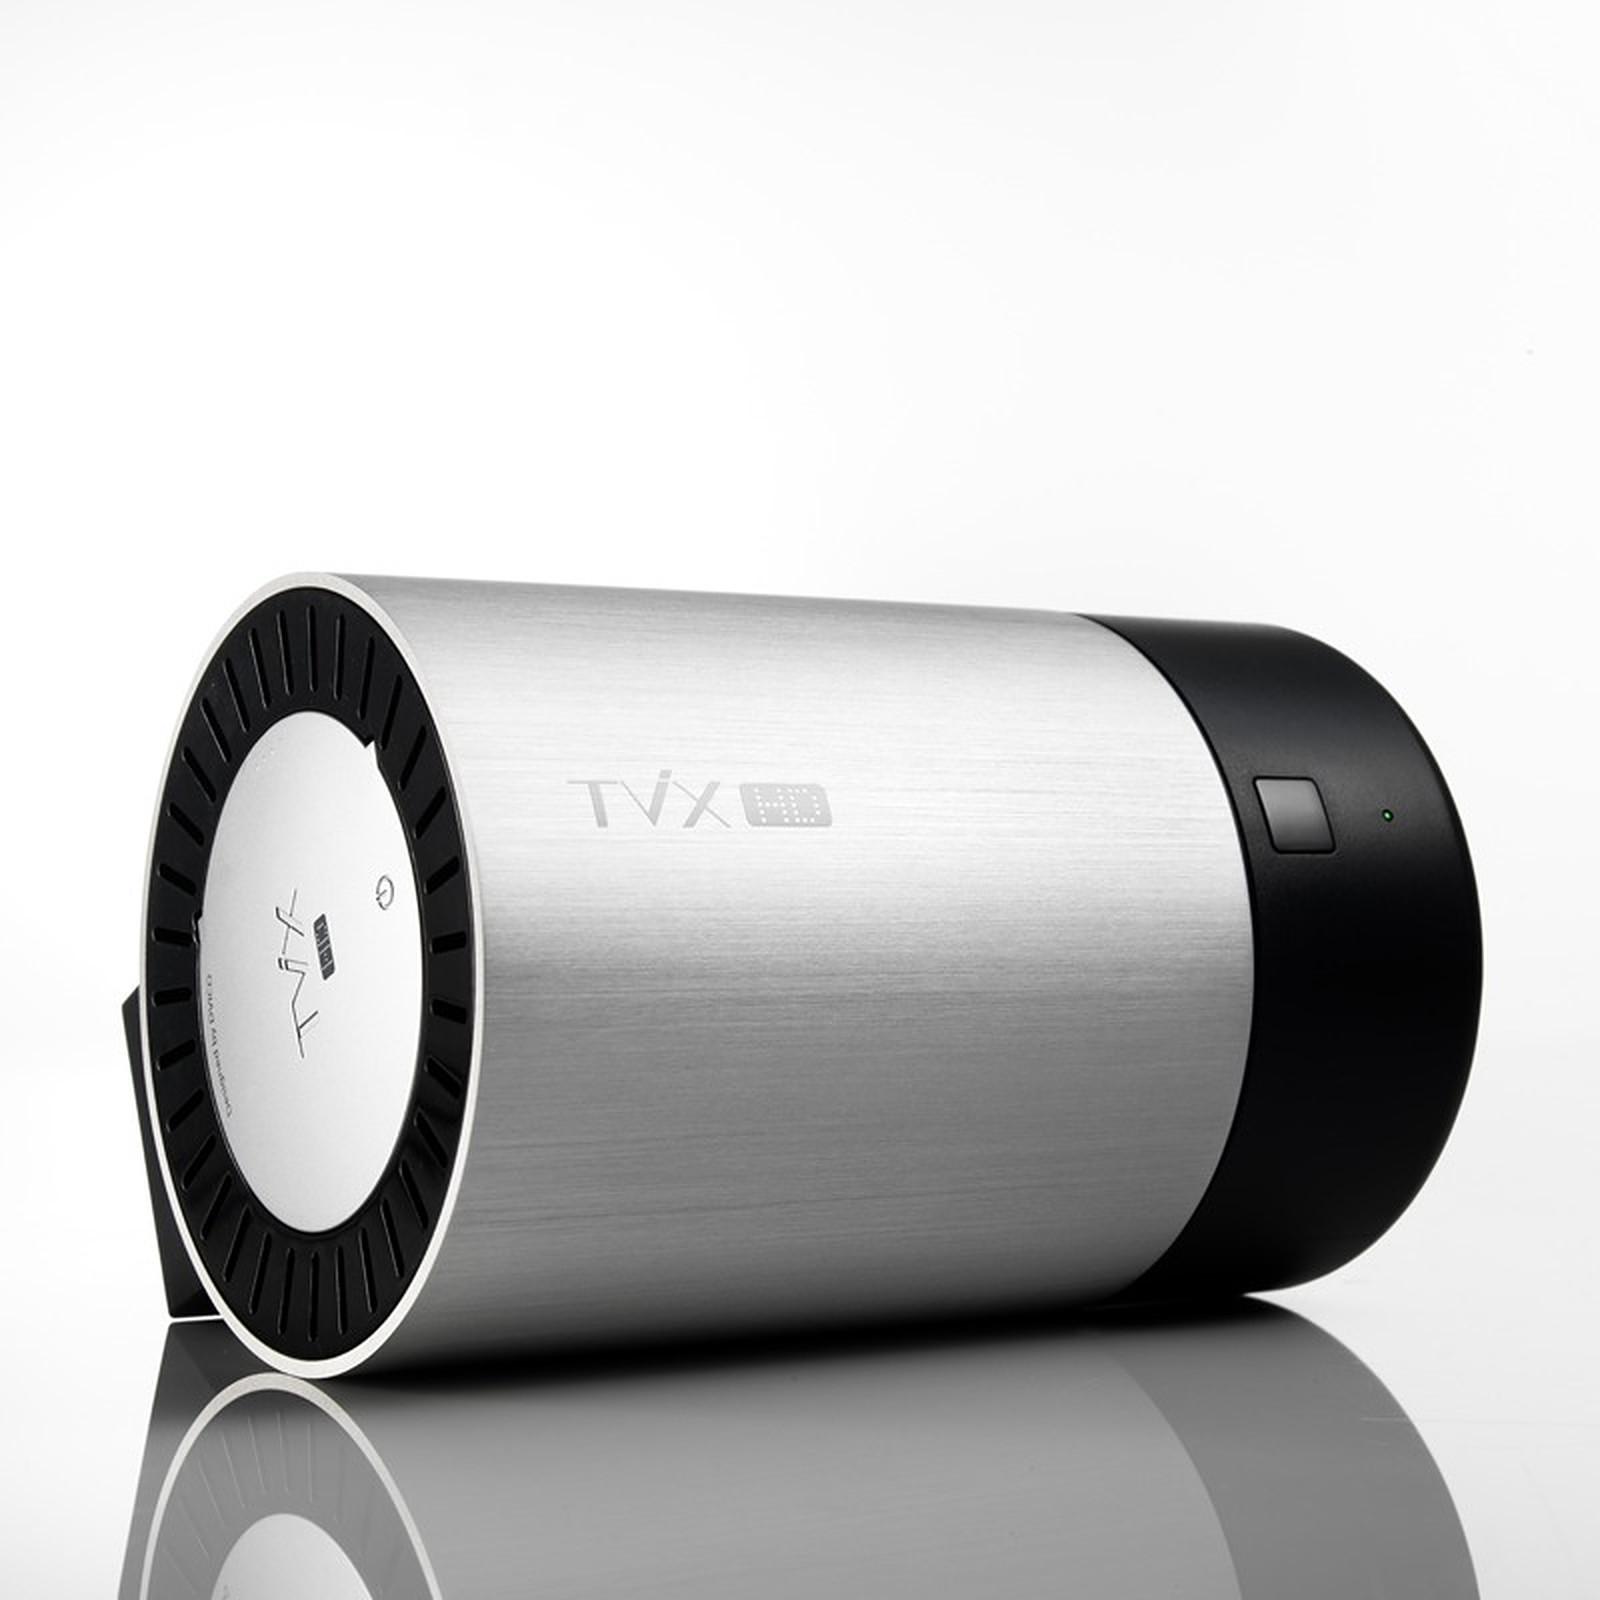 DViCO TViX HD Cafe WiFi Silver